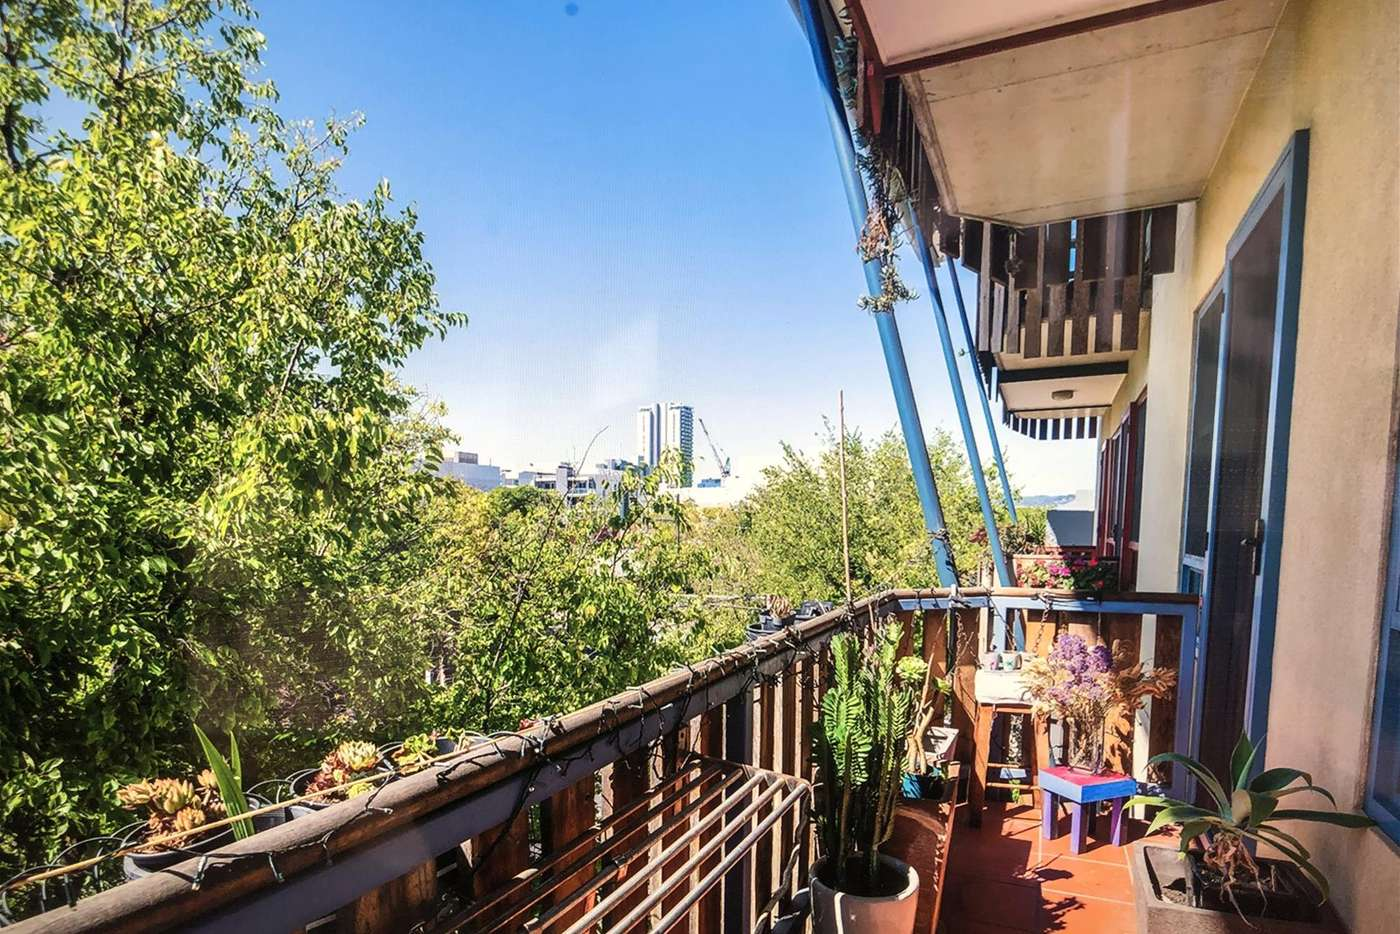 Main view of Homely apartment listing, <![CDATA[103]]> <![CDATA[Sturt Street]]>, Adelaide SA 5000